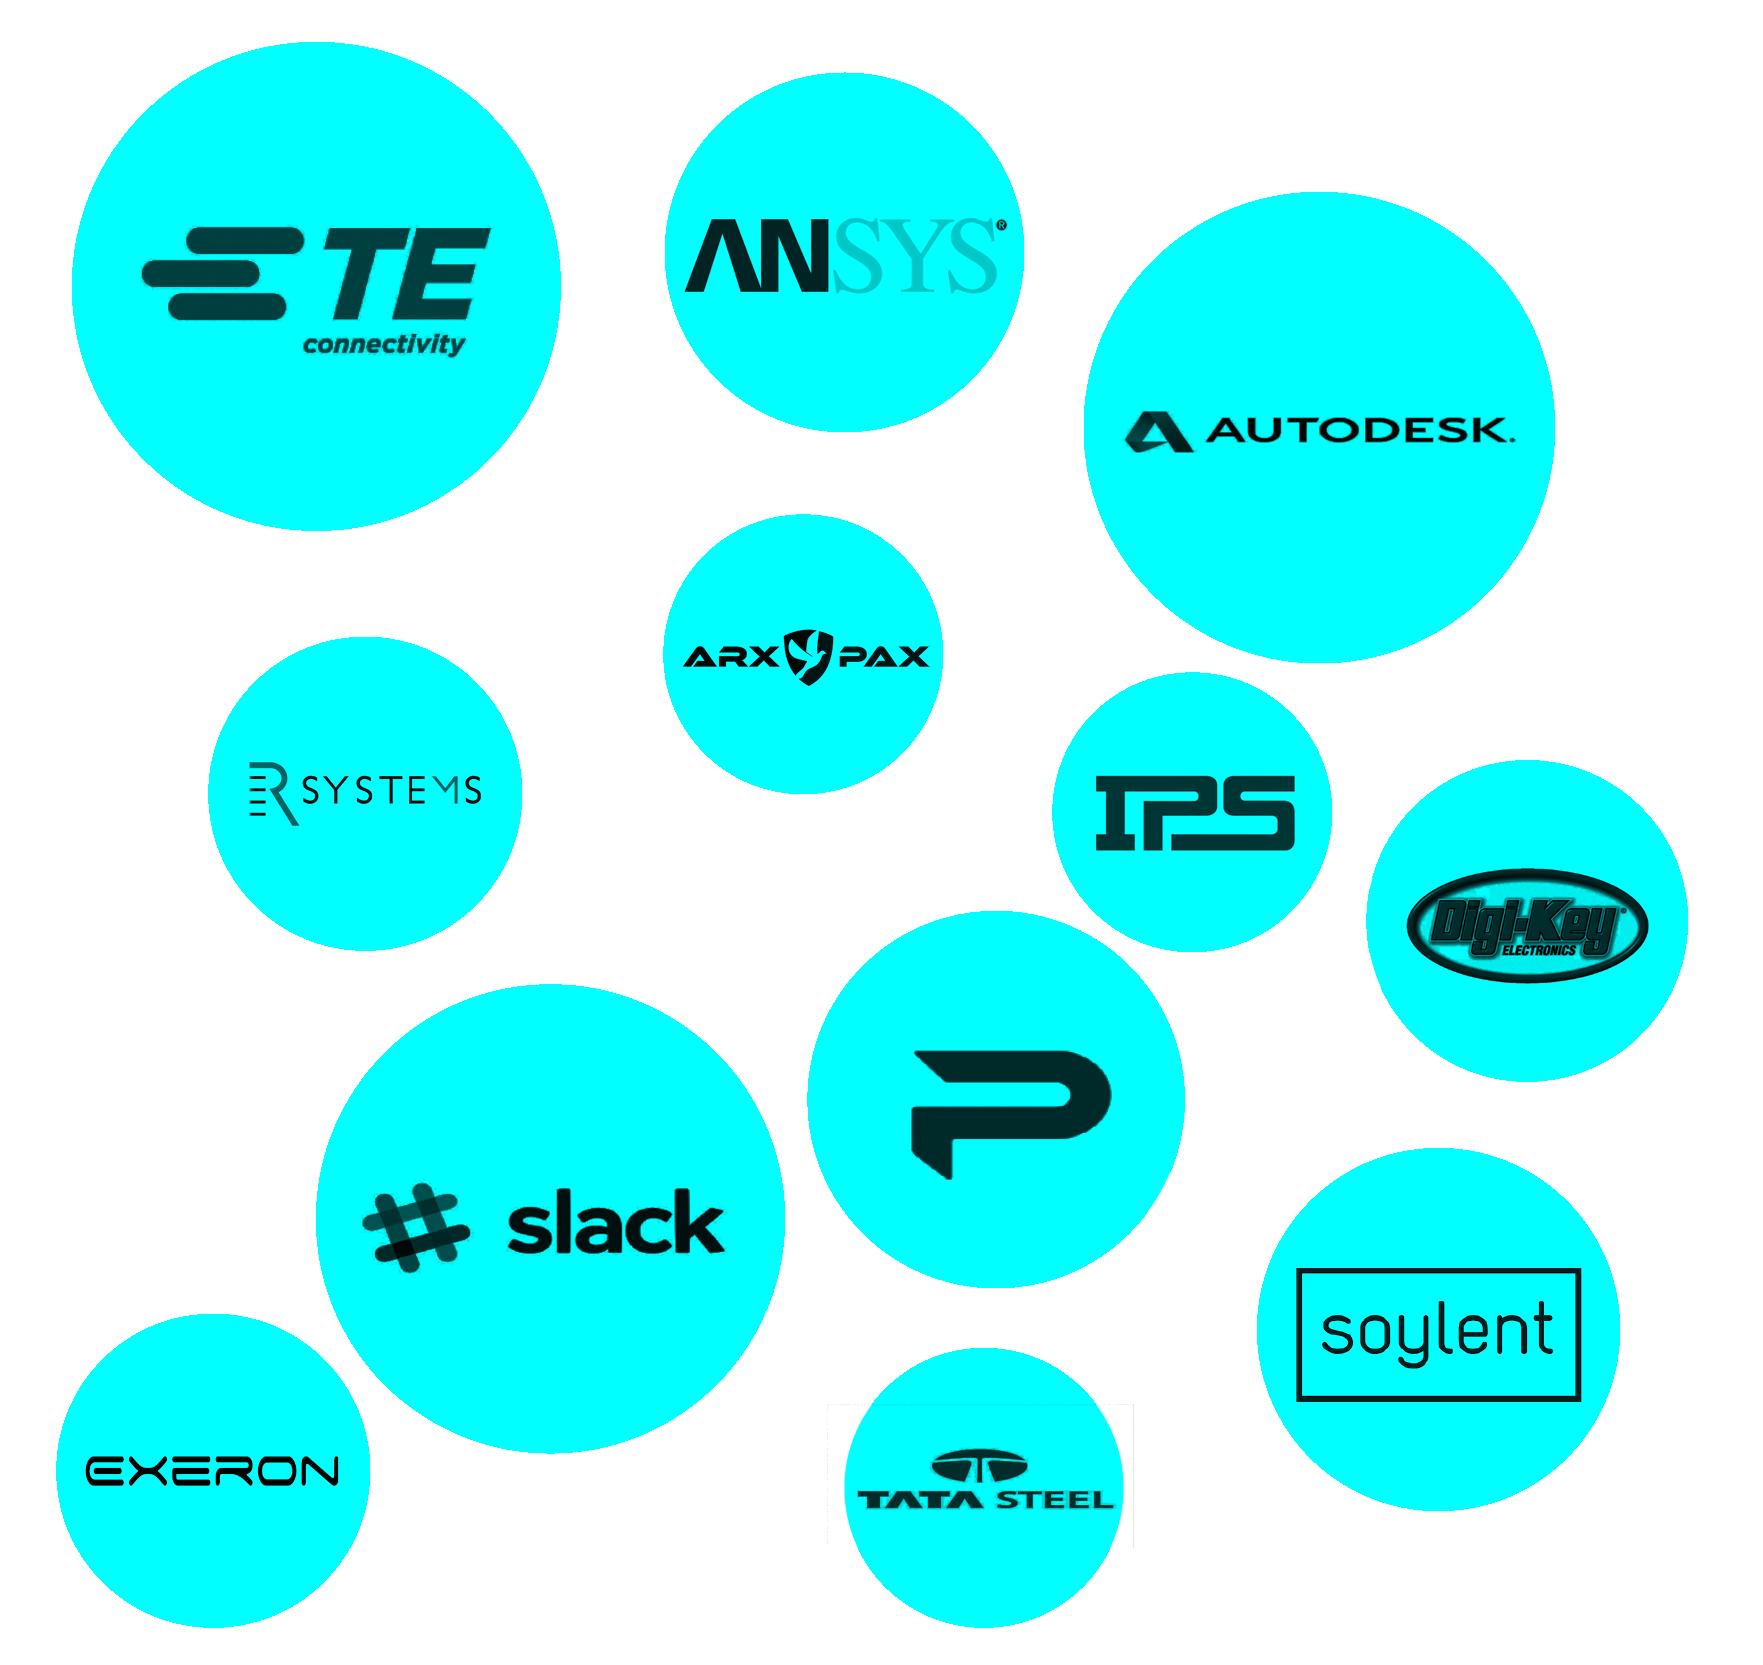 slack arx pax autodesk tata steel TE connectivity partners sponsors hyperloop